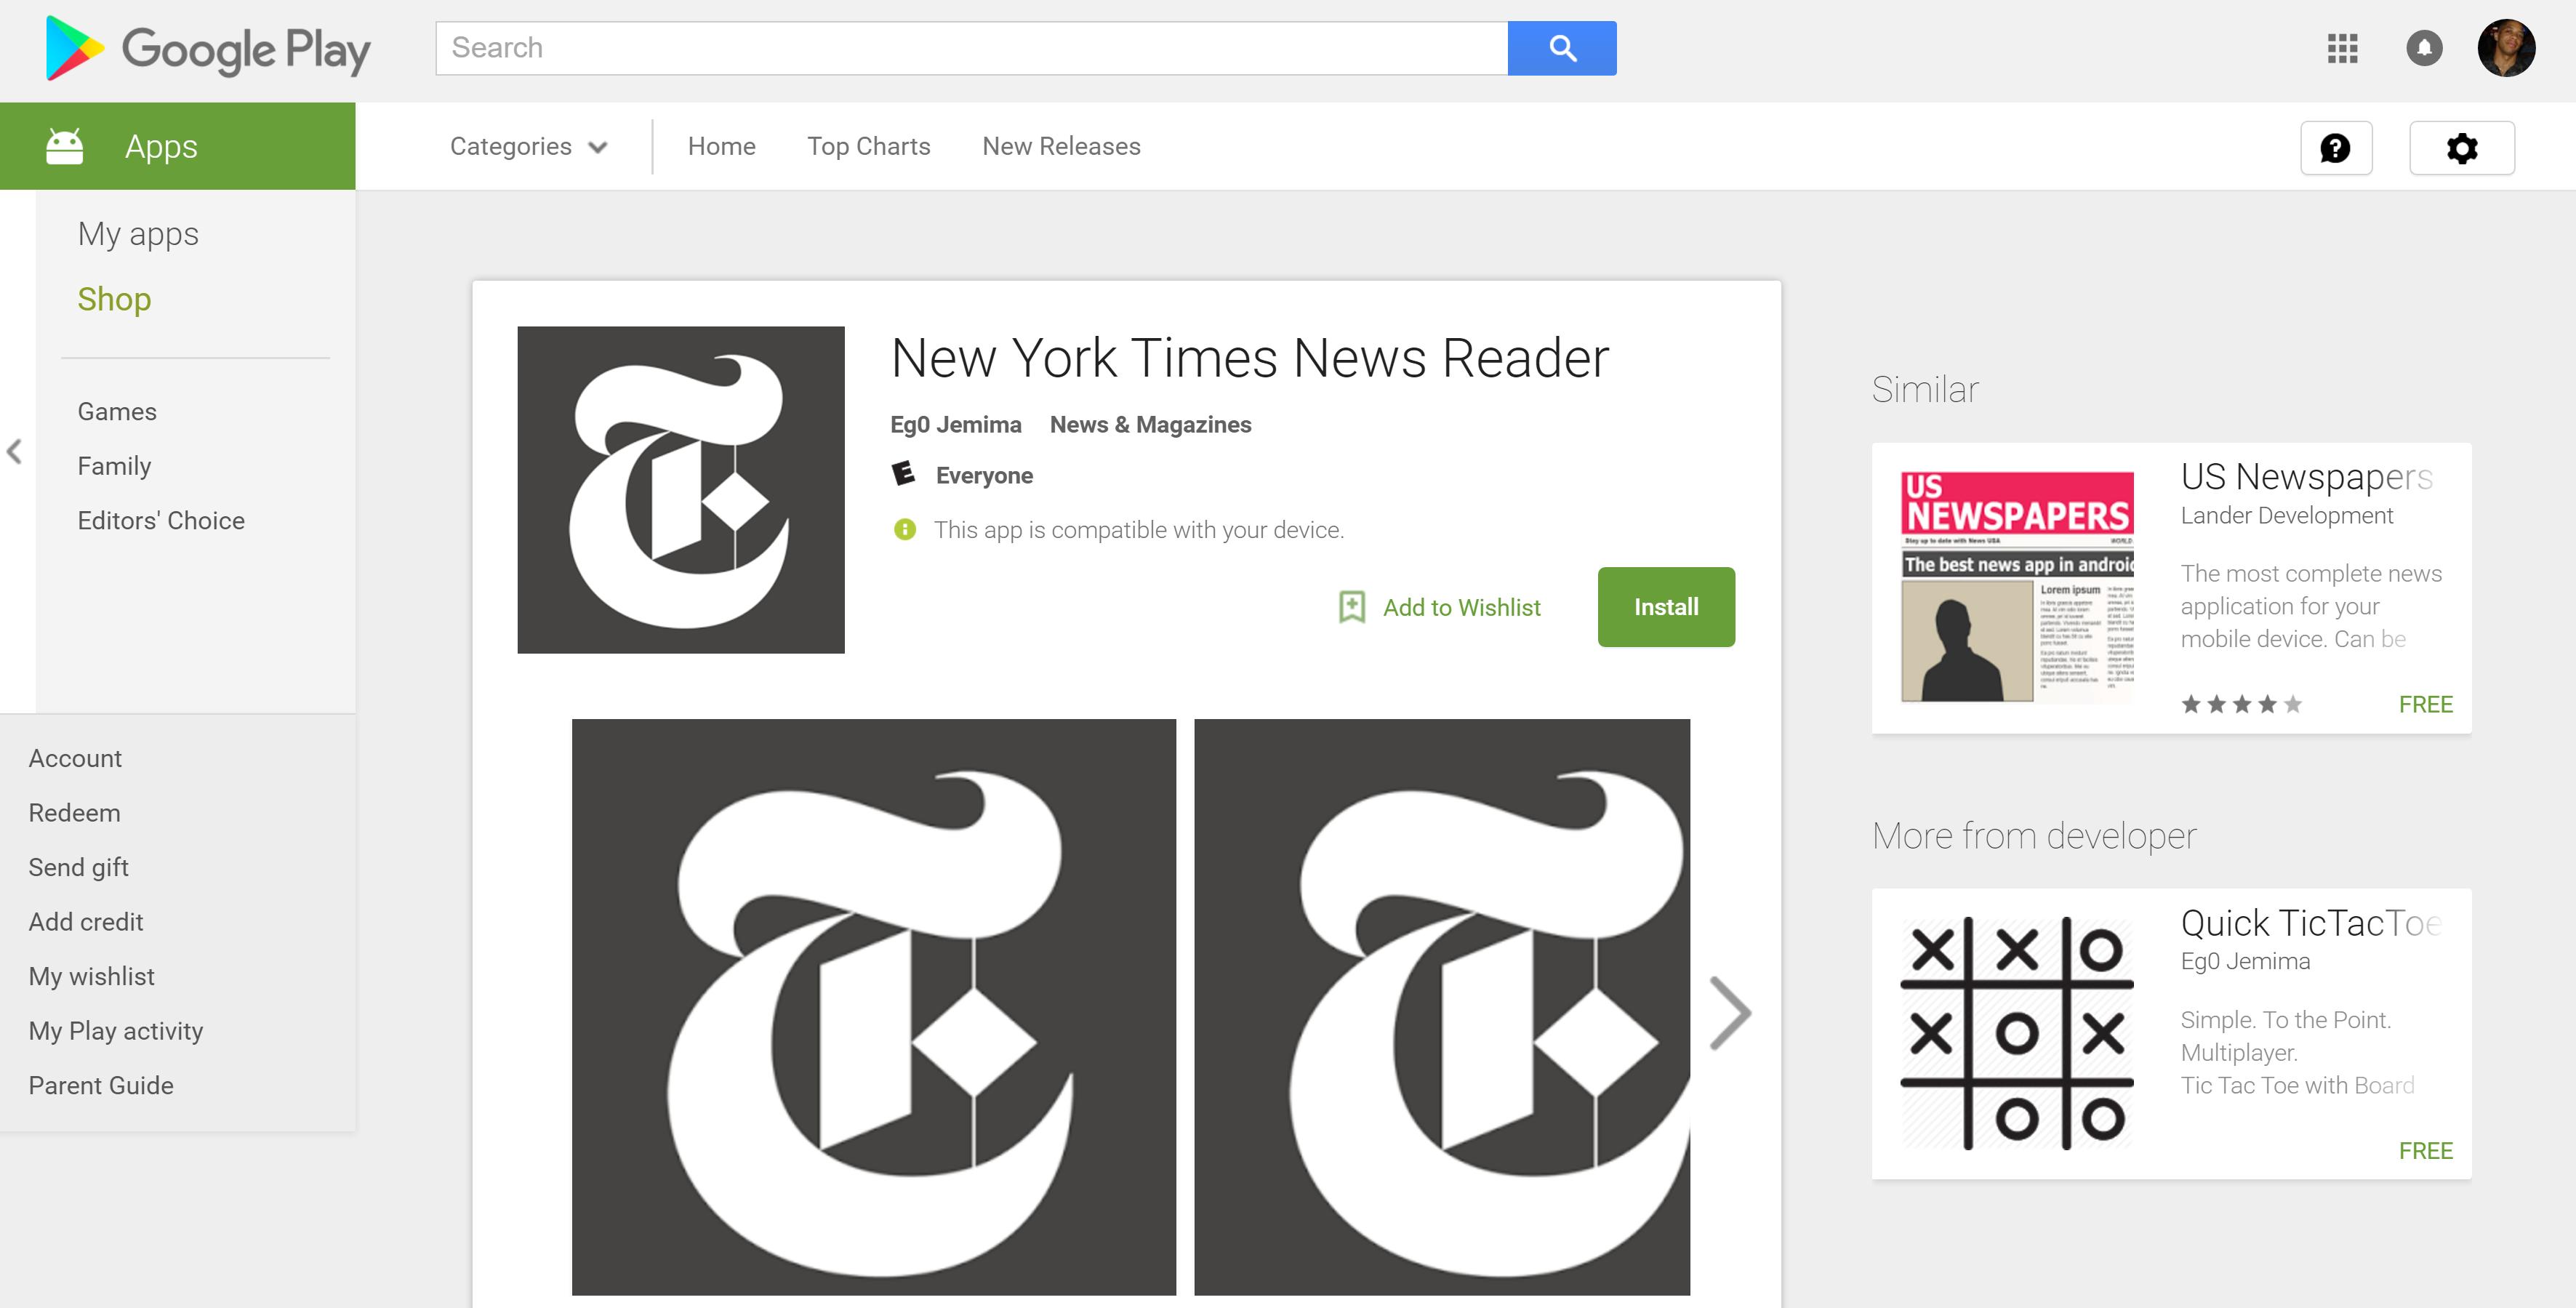 New York Times Reader